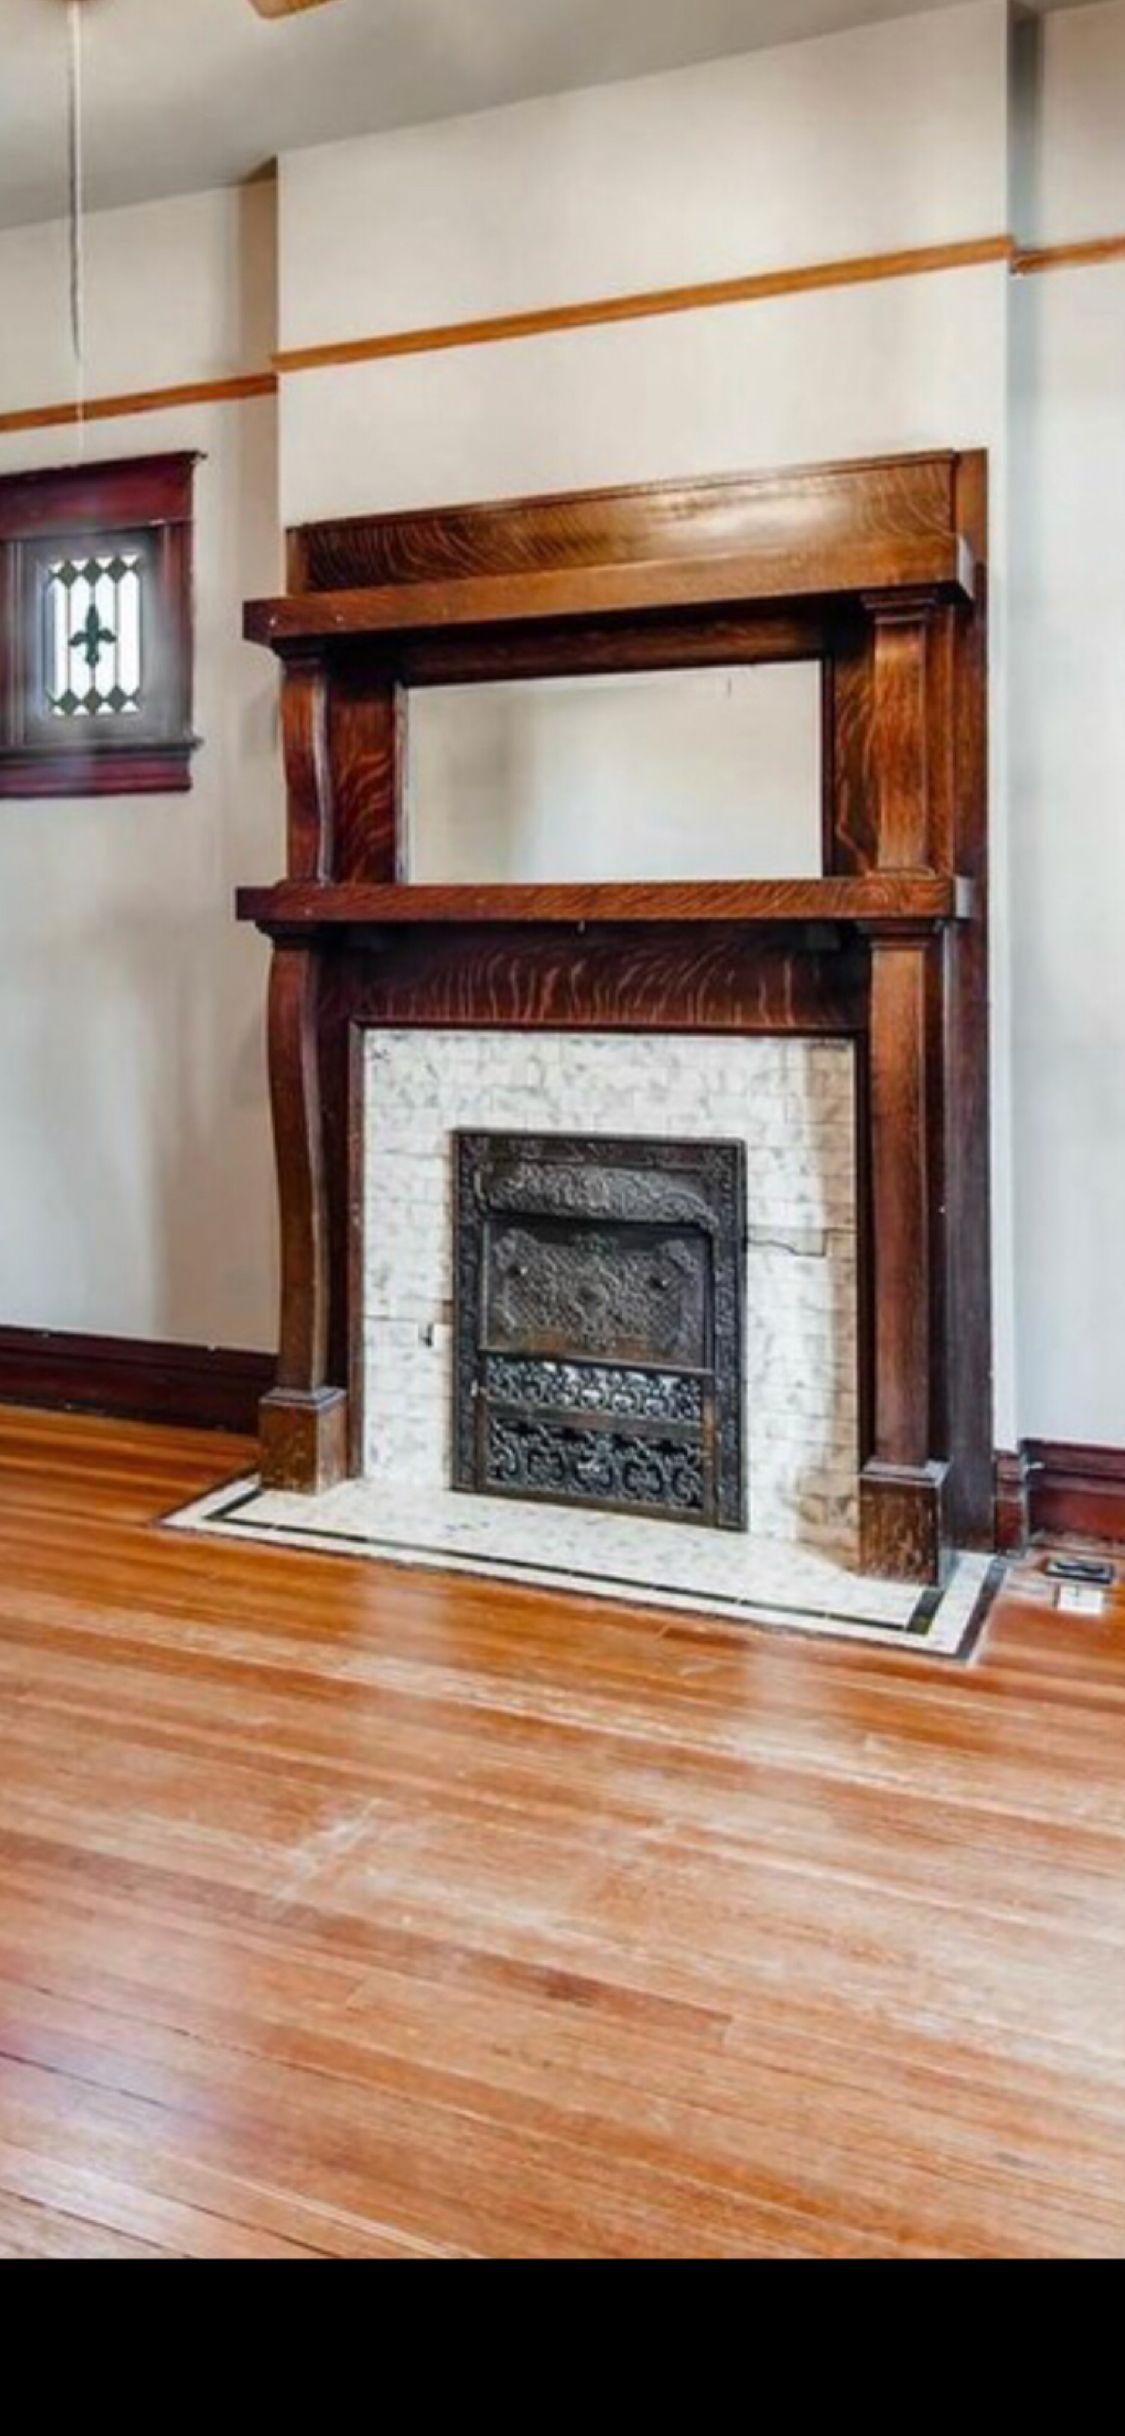 victorian fireplace and tile surround coal burner denver co rh pinterest com fireplace stores denver co fireplace inserts denver colorado